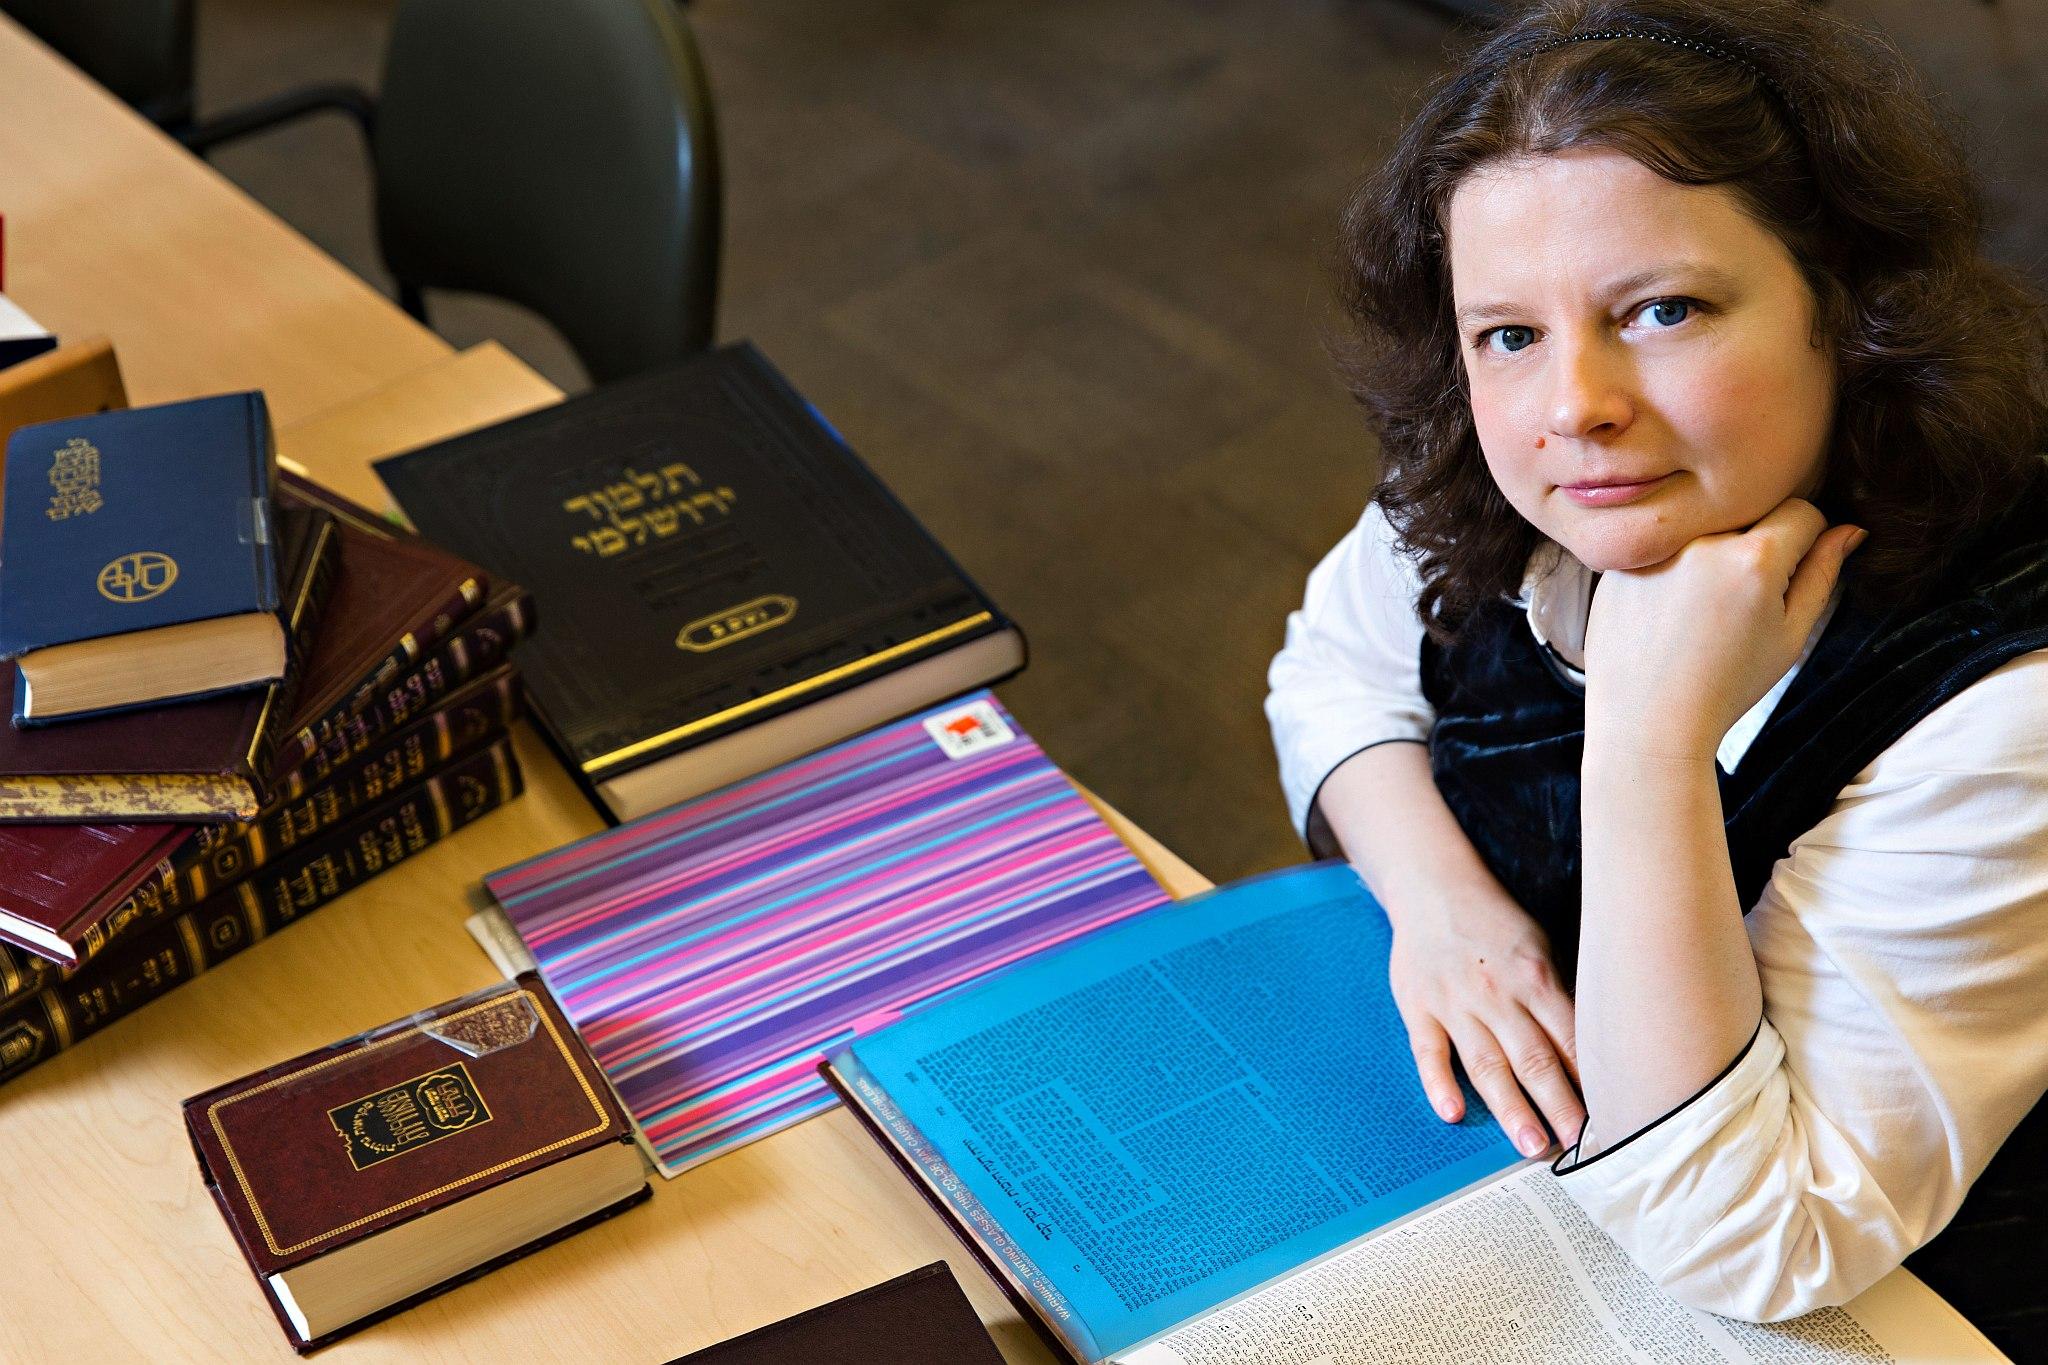 Miriam Gonczarska (fot. Leslie Barbaro)